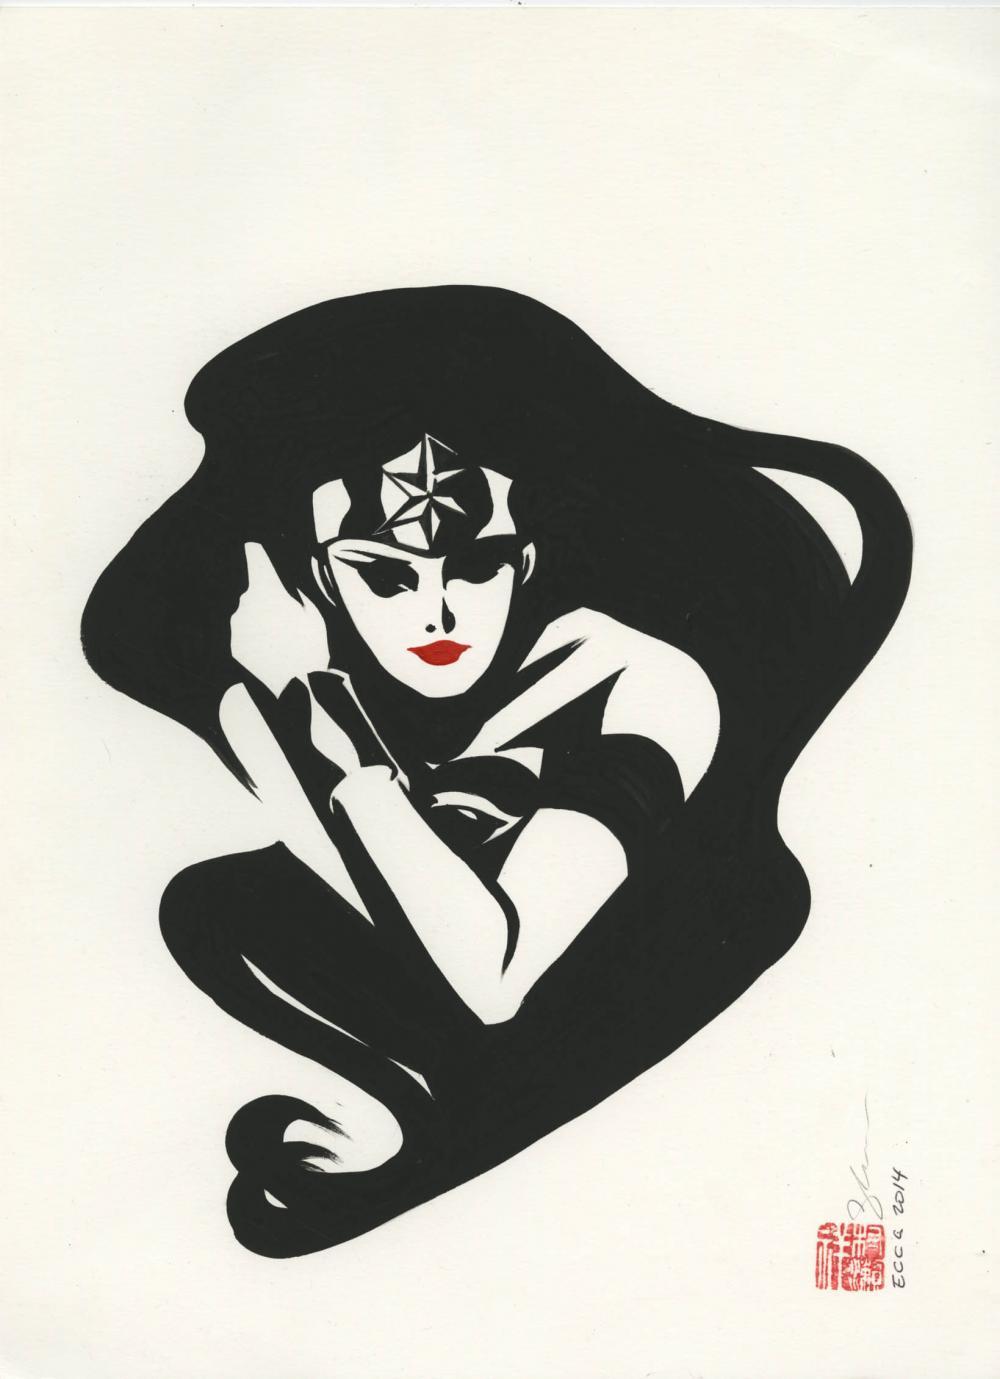 Wonder Woman by Sho Murase